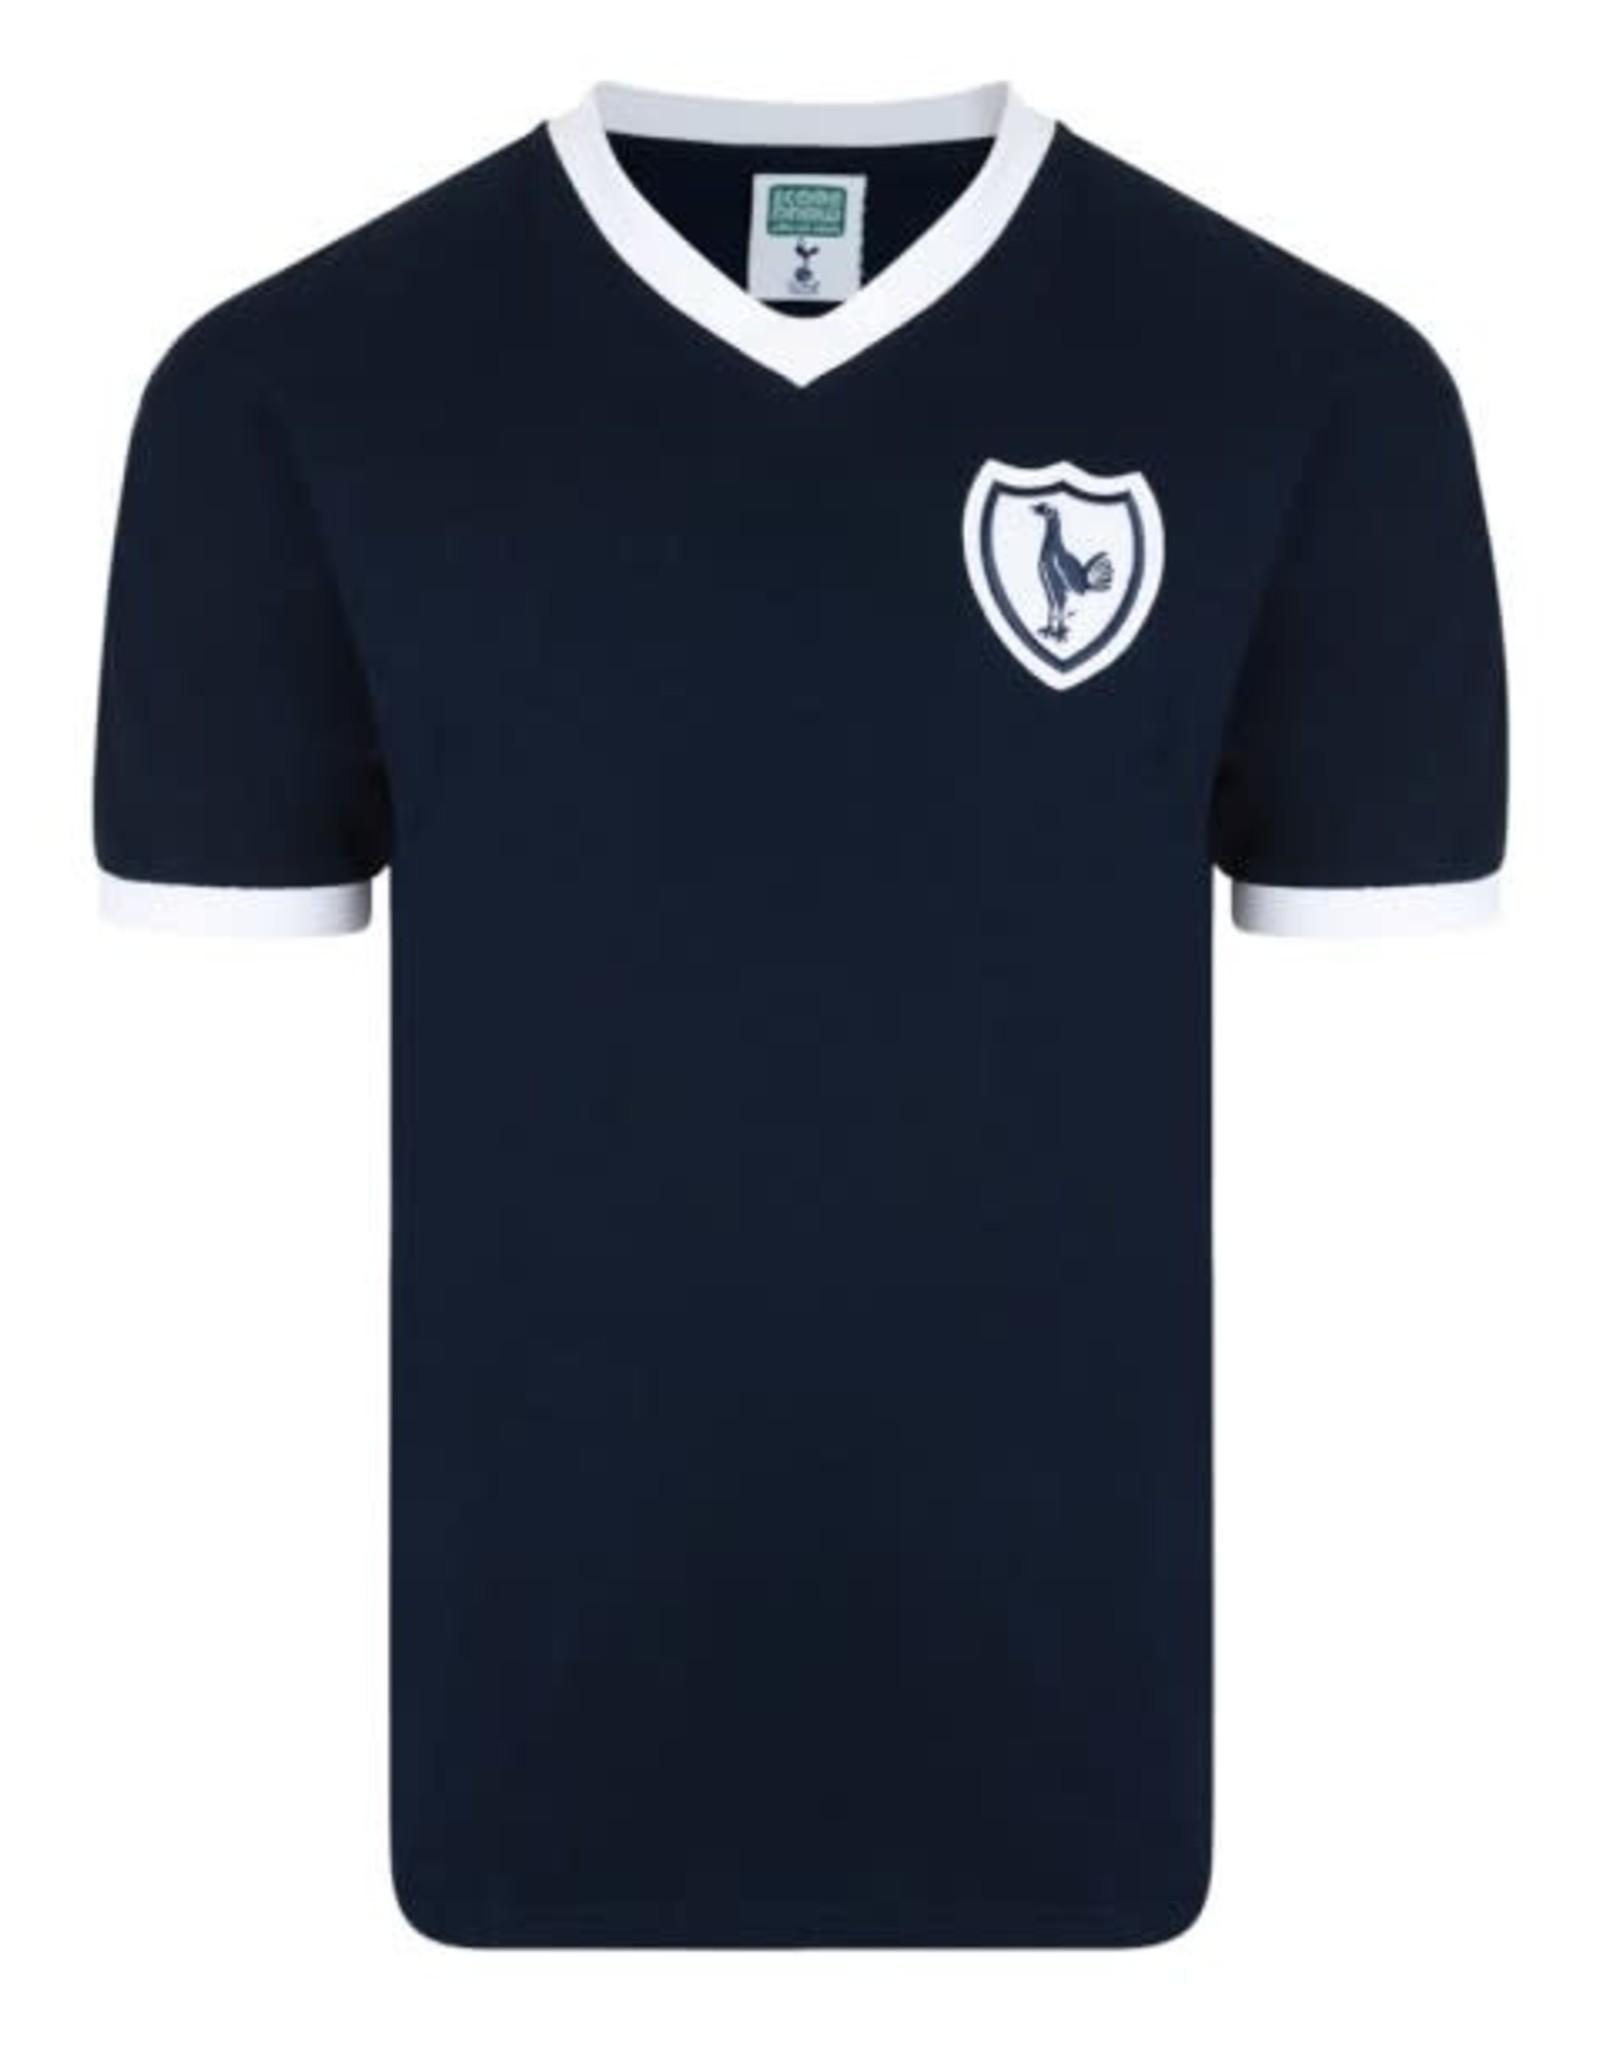 Tottenham 1962 Retro Shirt (away) #8